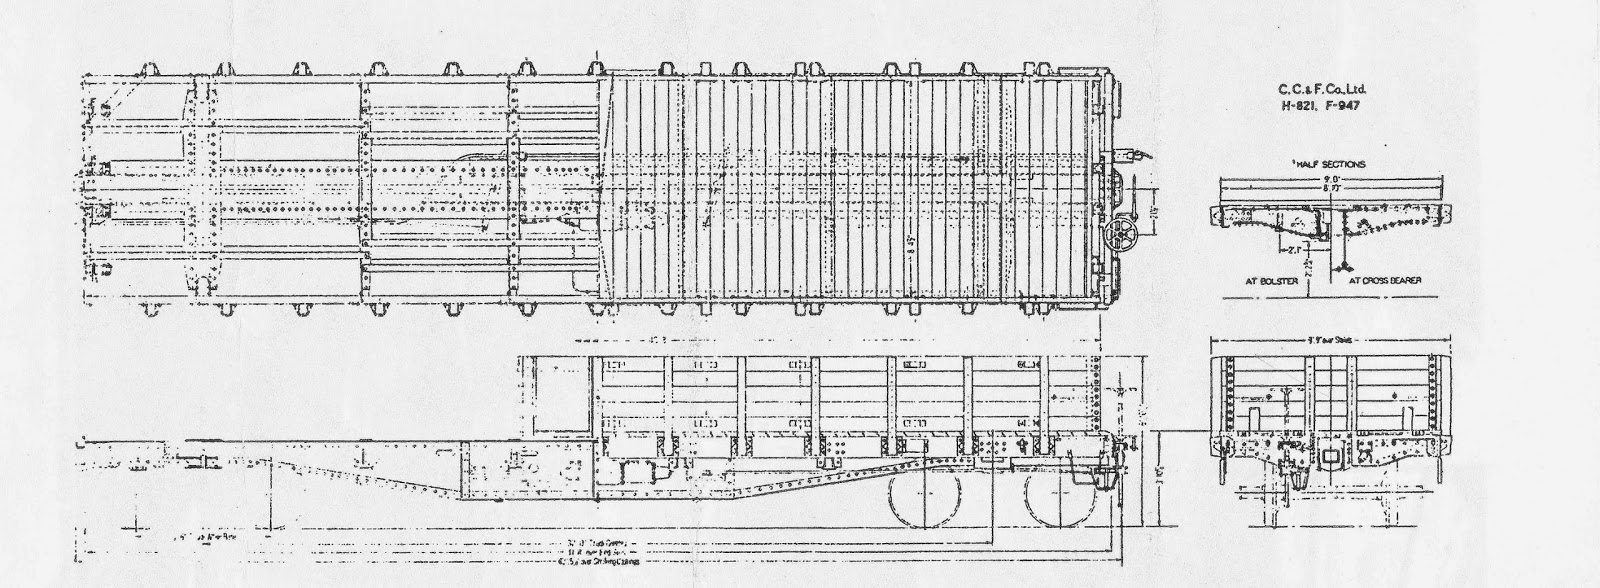 1950 western car lift schematic custom wiring diagram u2022 chamberlain garage door sensor wiring residential garage electrical wiring diagrams [ 1600 x 588 Pixel ]